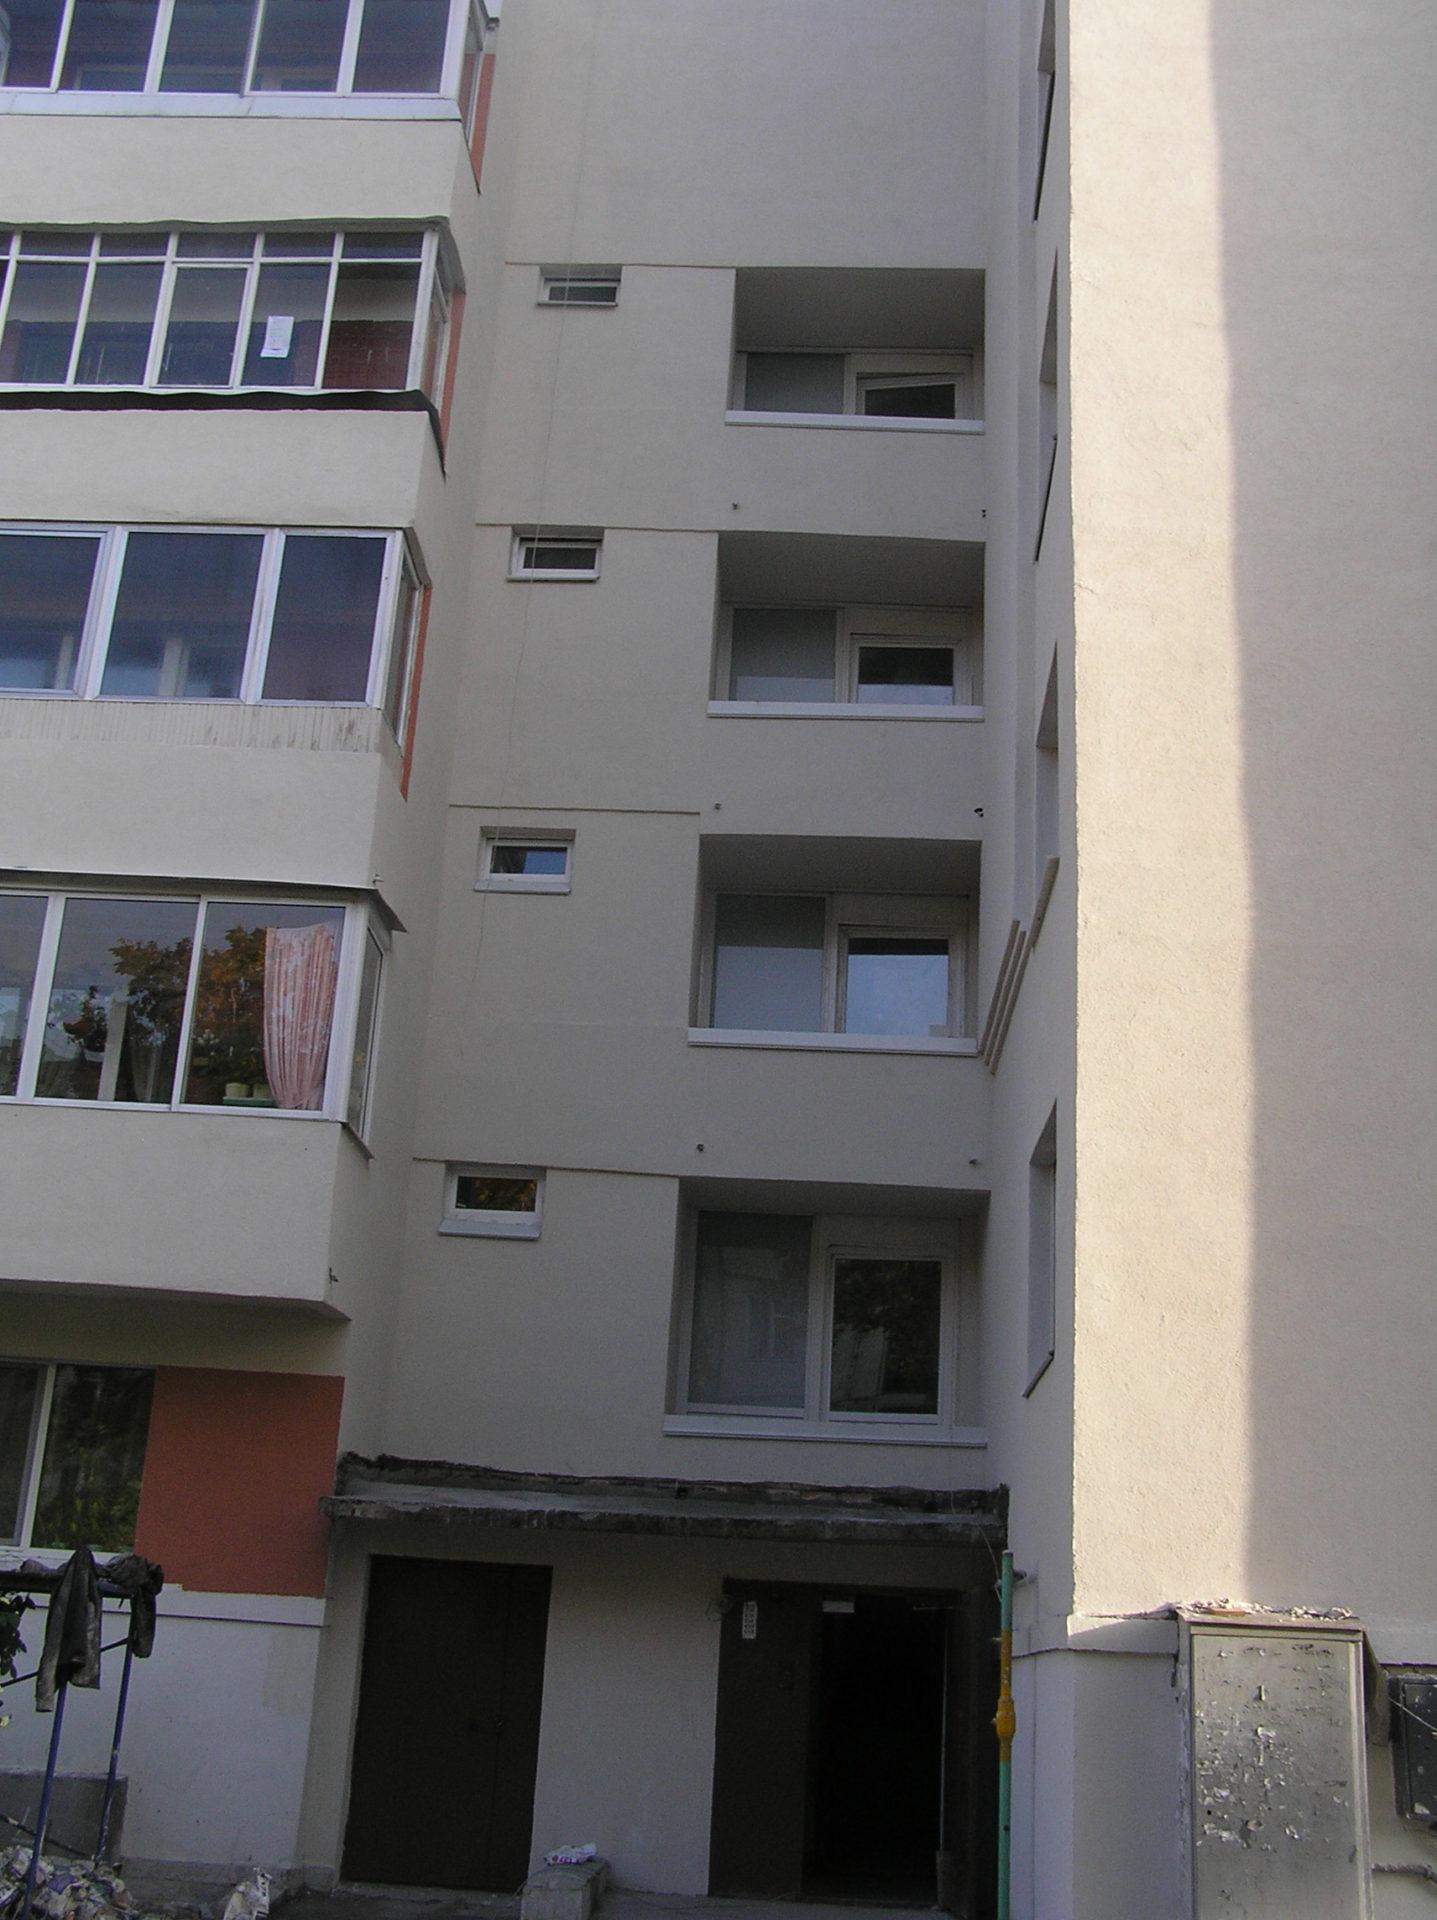 Окна, фасад